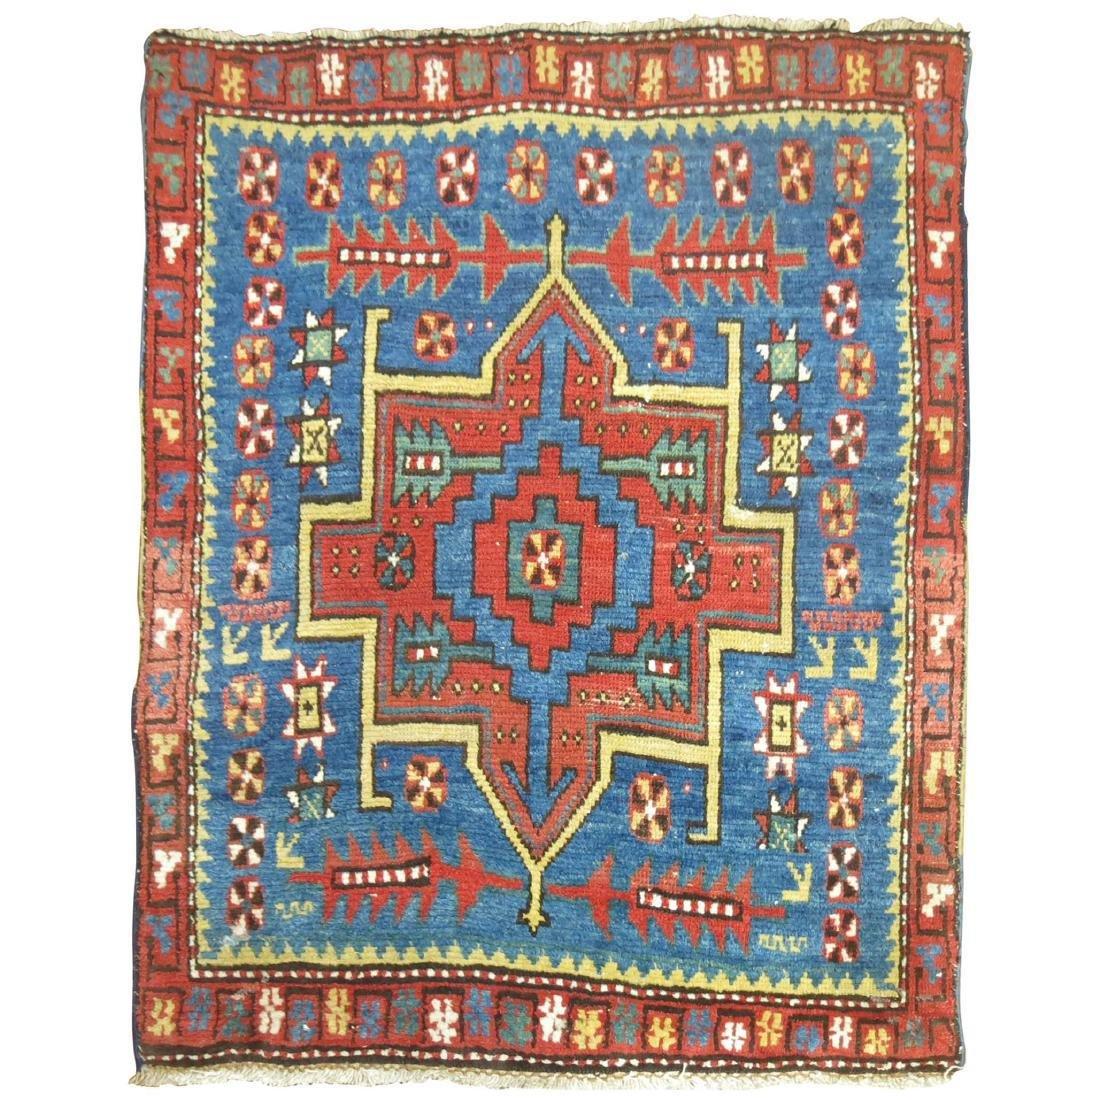 Northwest Persian Heriz Rug 2.4x2.10